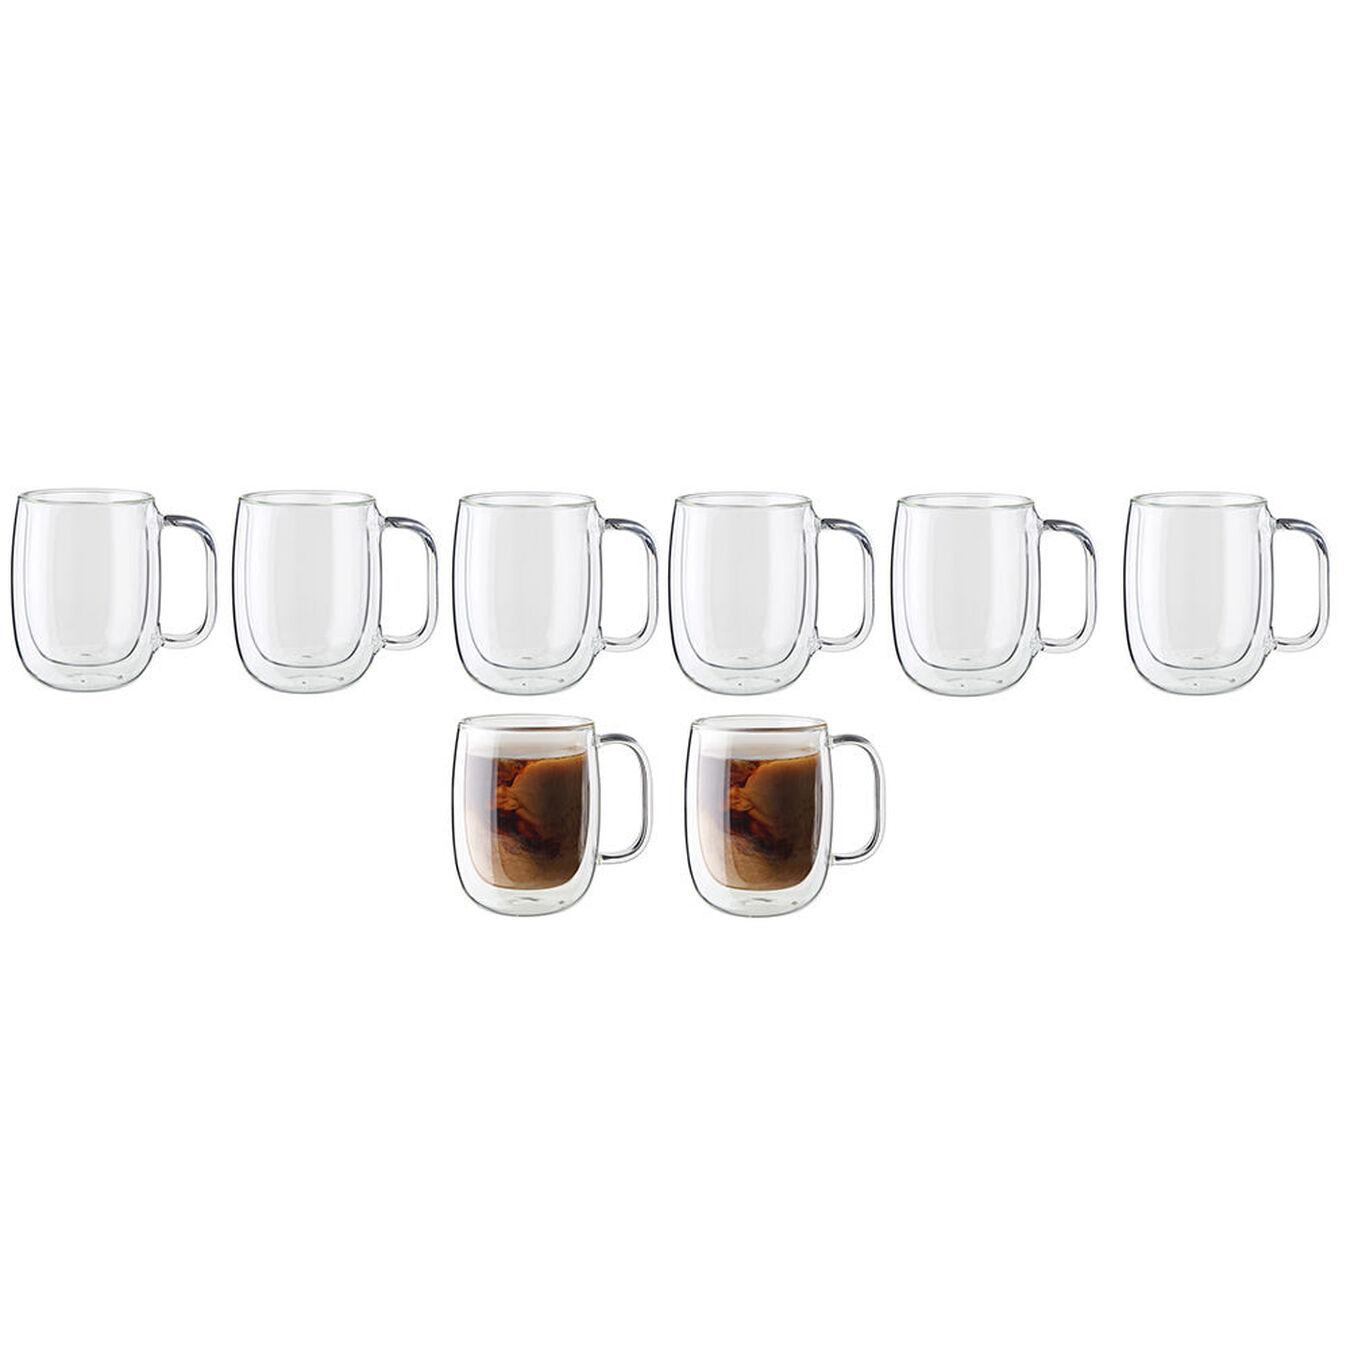 8-pc Double-Wall Glass Coffee Mug Set,,large 1